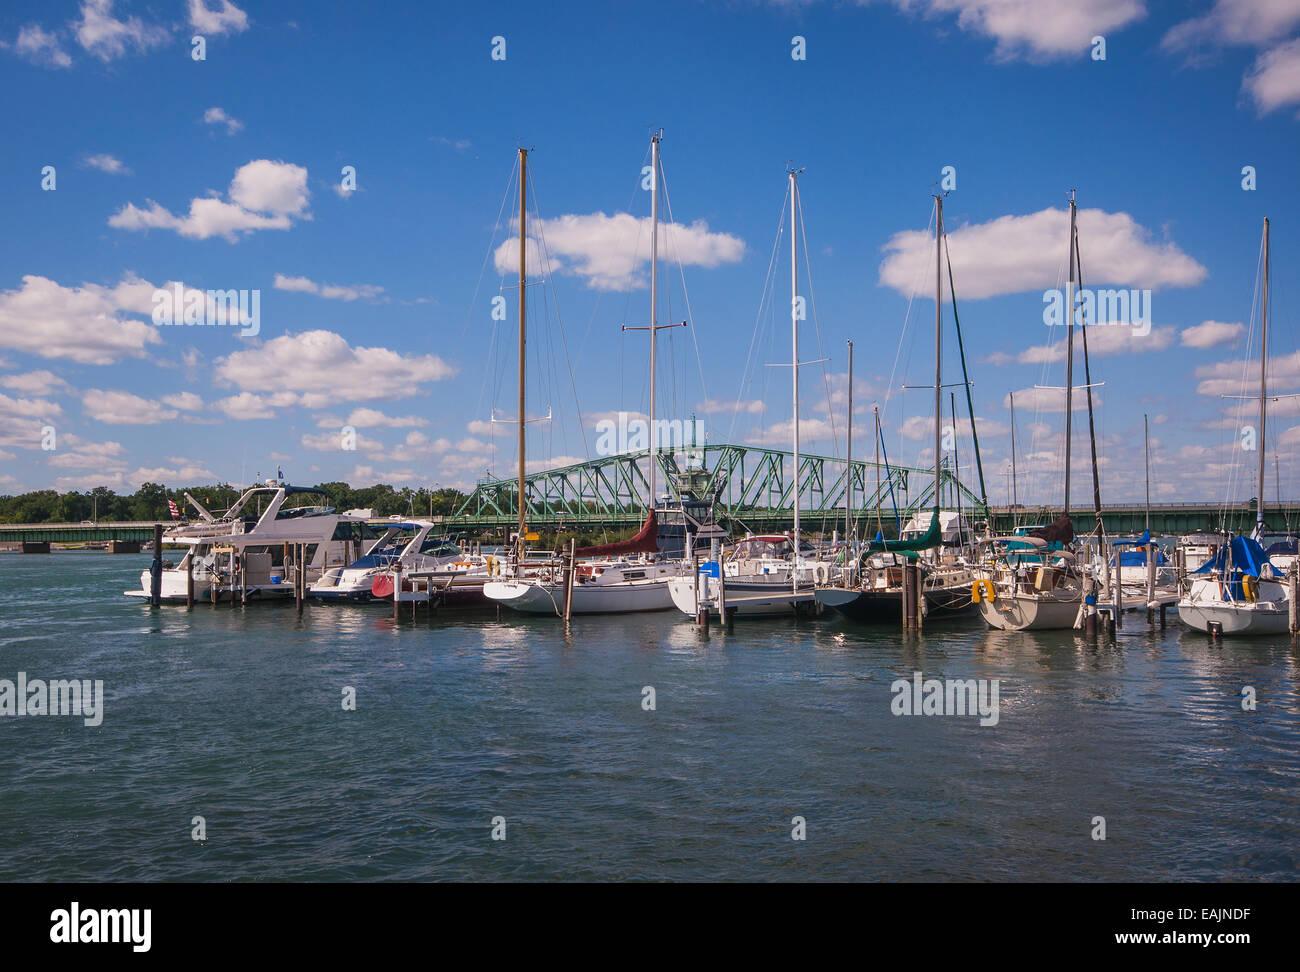 Detroit River South Boat Marina and Bridge - Stock Image